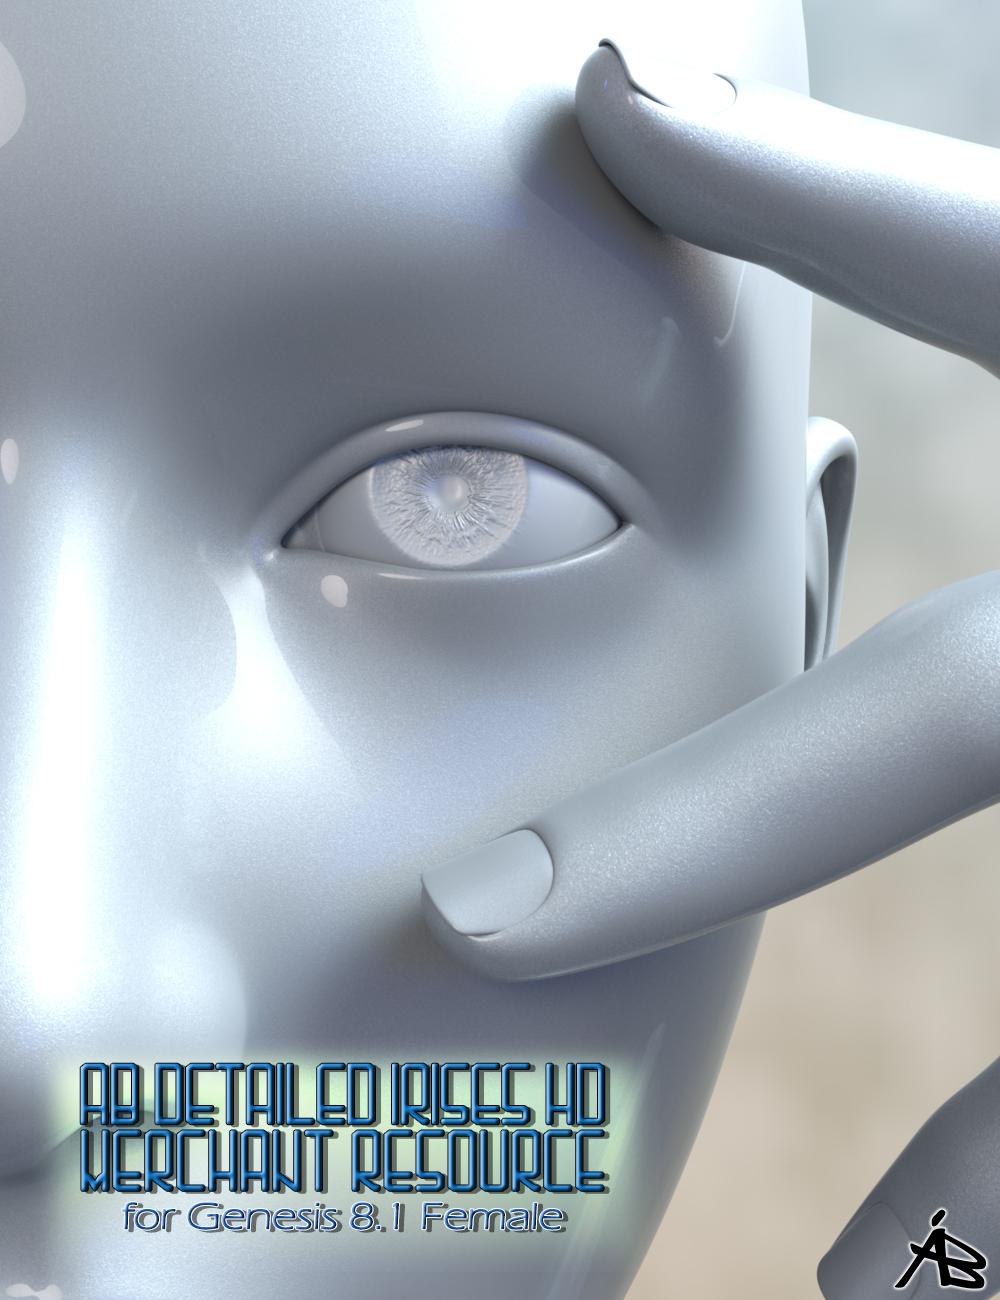 AB Detailed Irises HD for Genesis 8.1 Female (MR) by: AuraBianca, 3D Models by Daz 3D